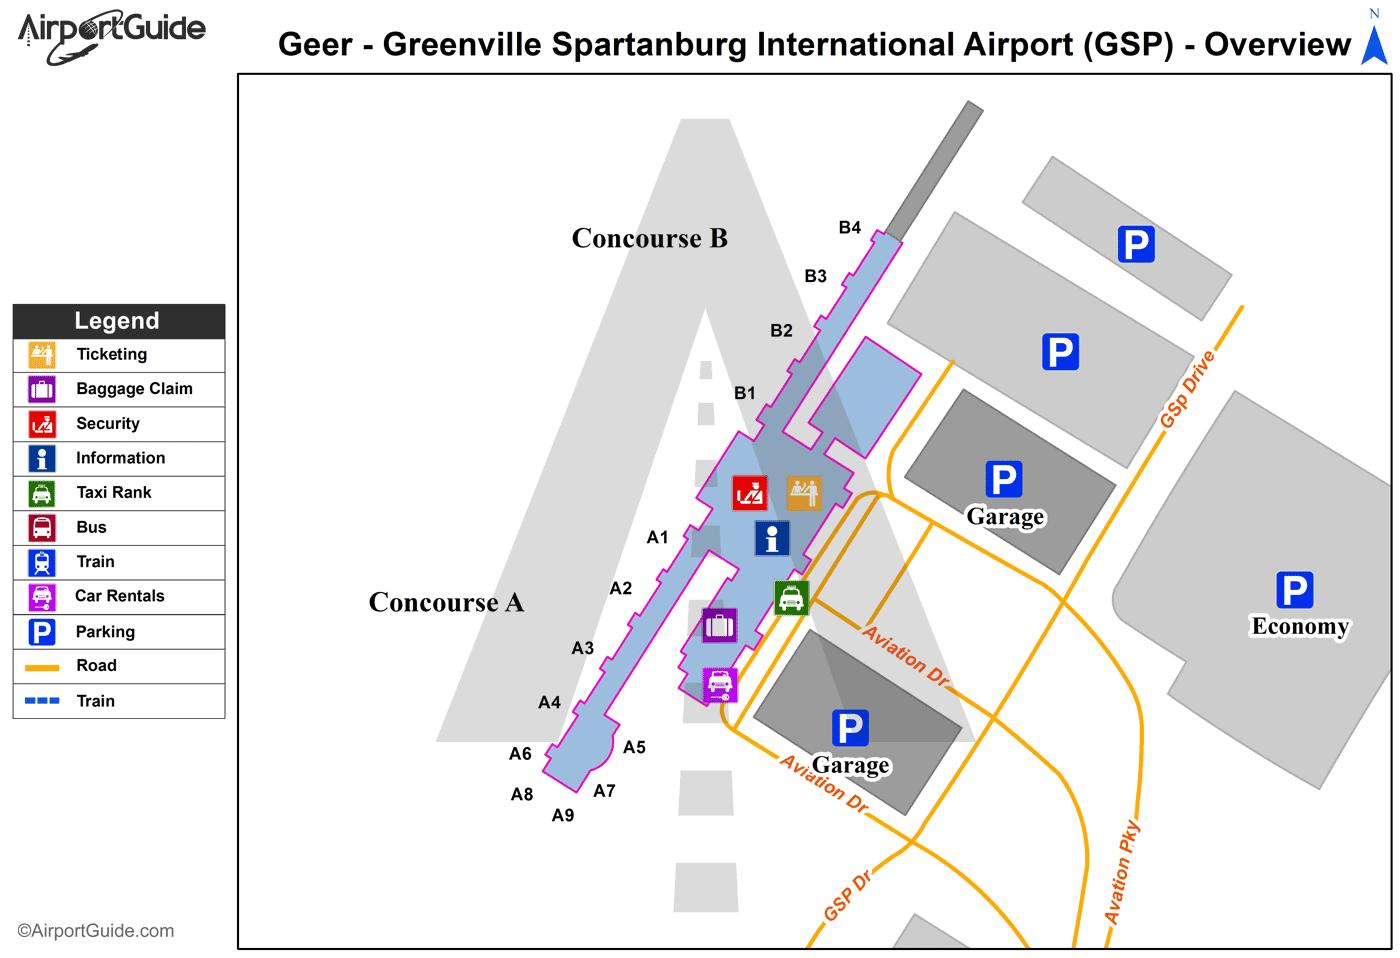 Gsp International Airport Car Rentals